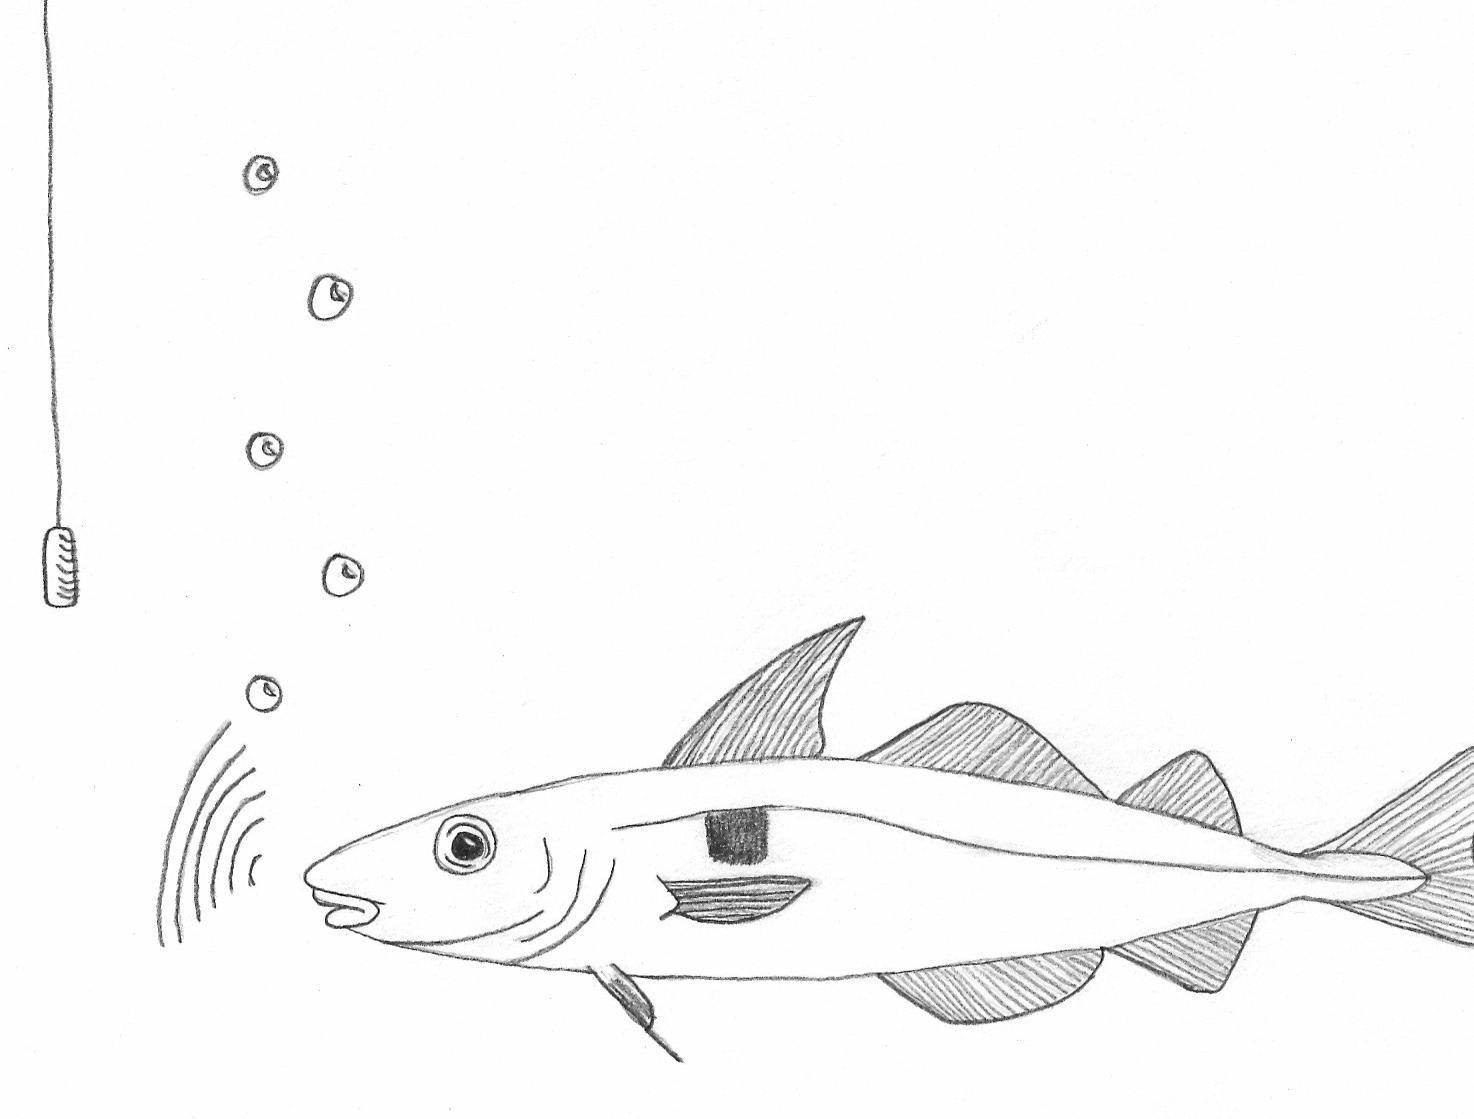 studies of soniferous fishes vocal behavior of fish